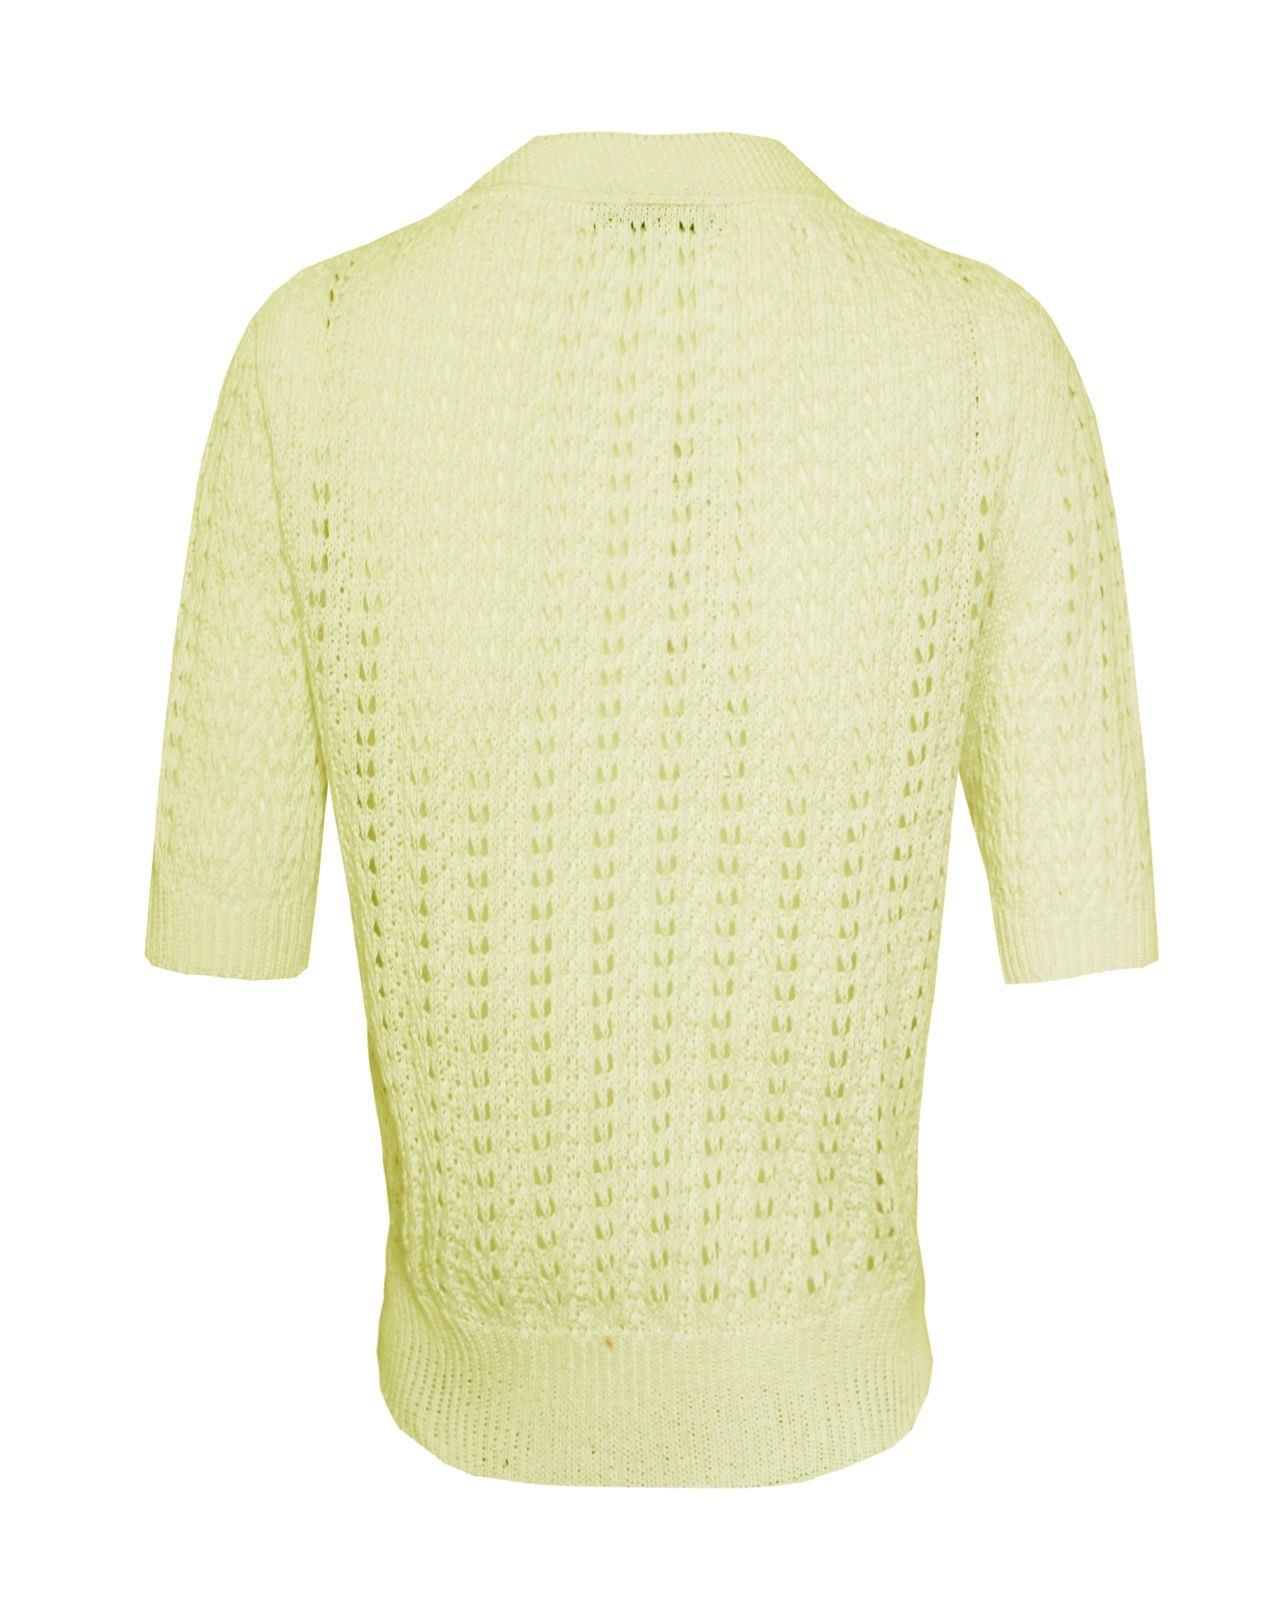 Mesdames-crochet-tricote-pour-femme-manches-courtes-hausser-brooched-cardigan-crop-top-8-14 miniature 13